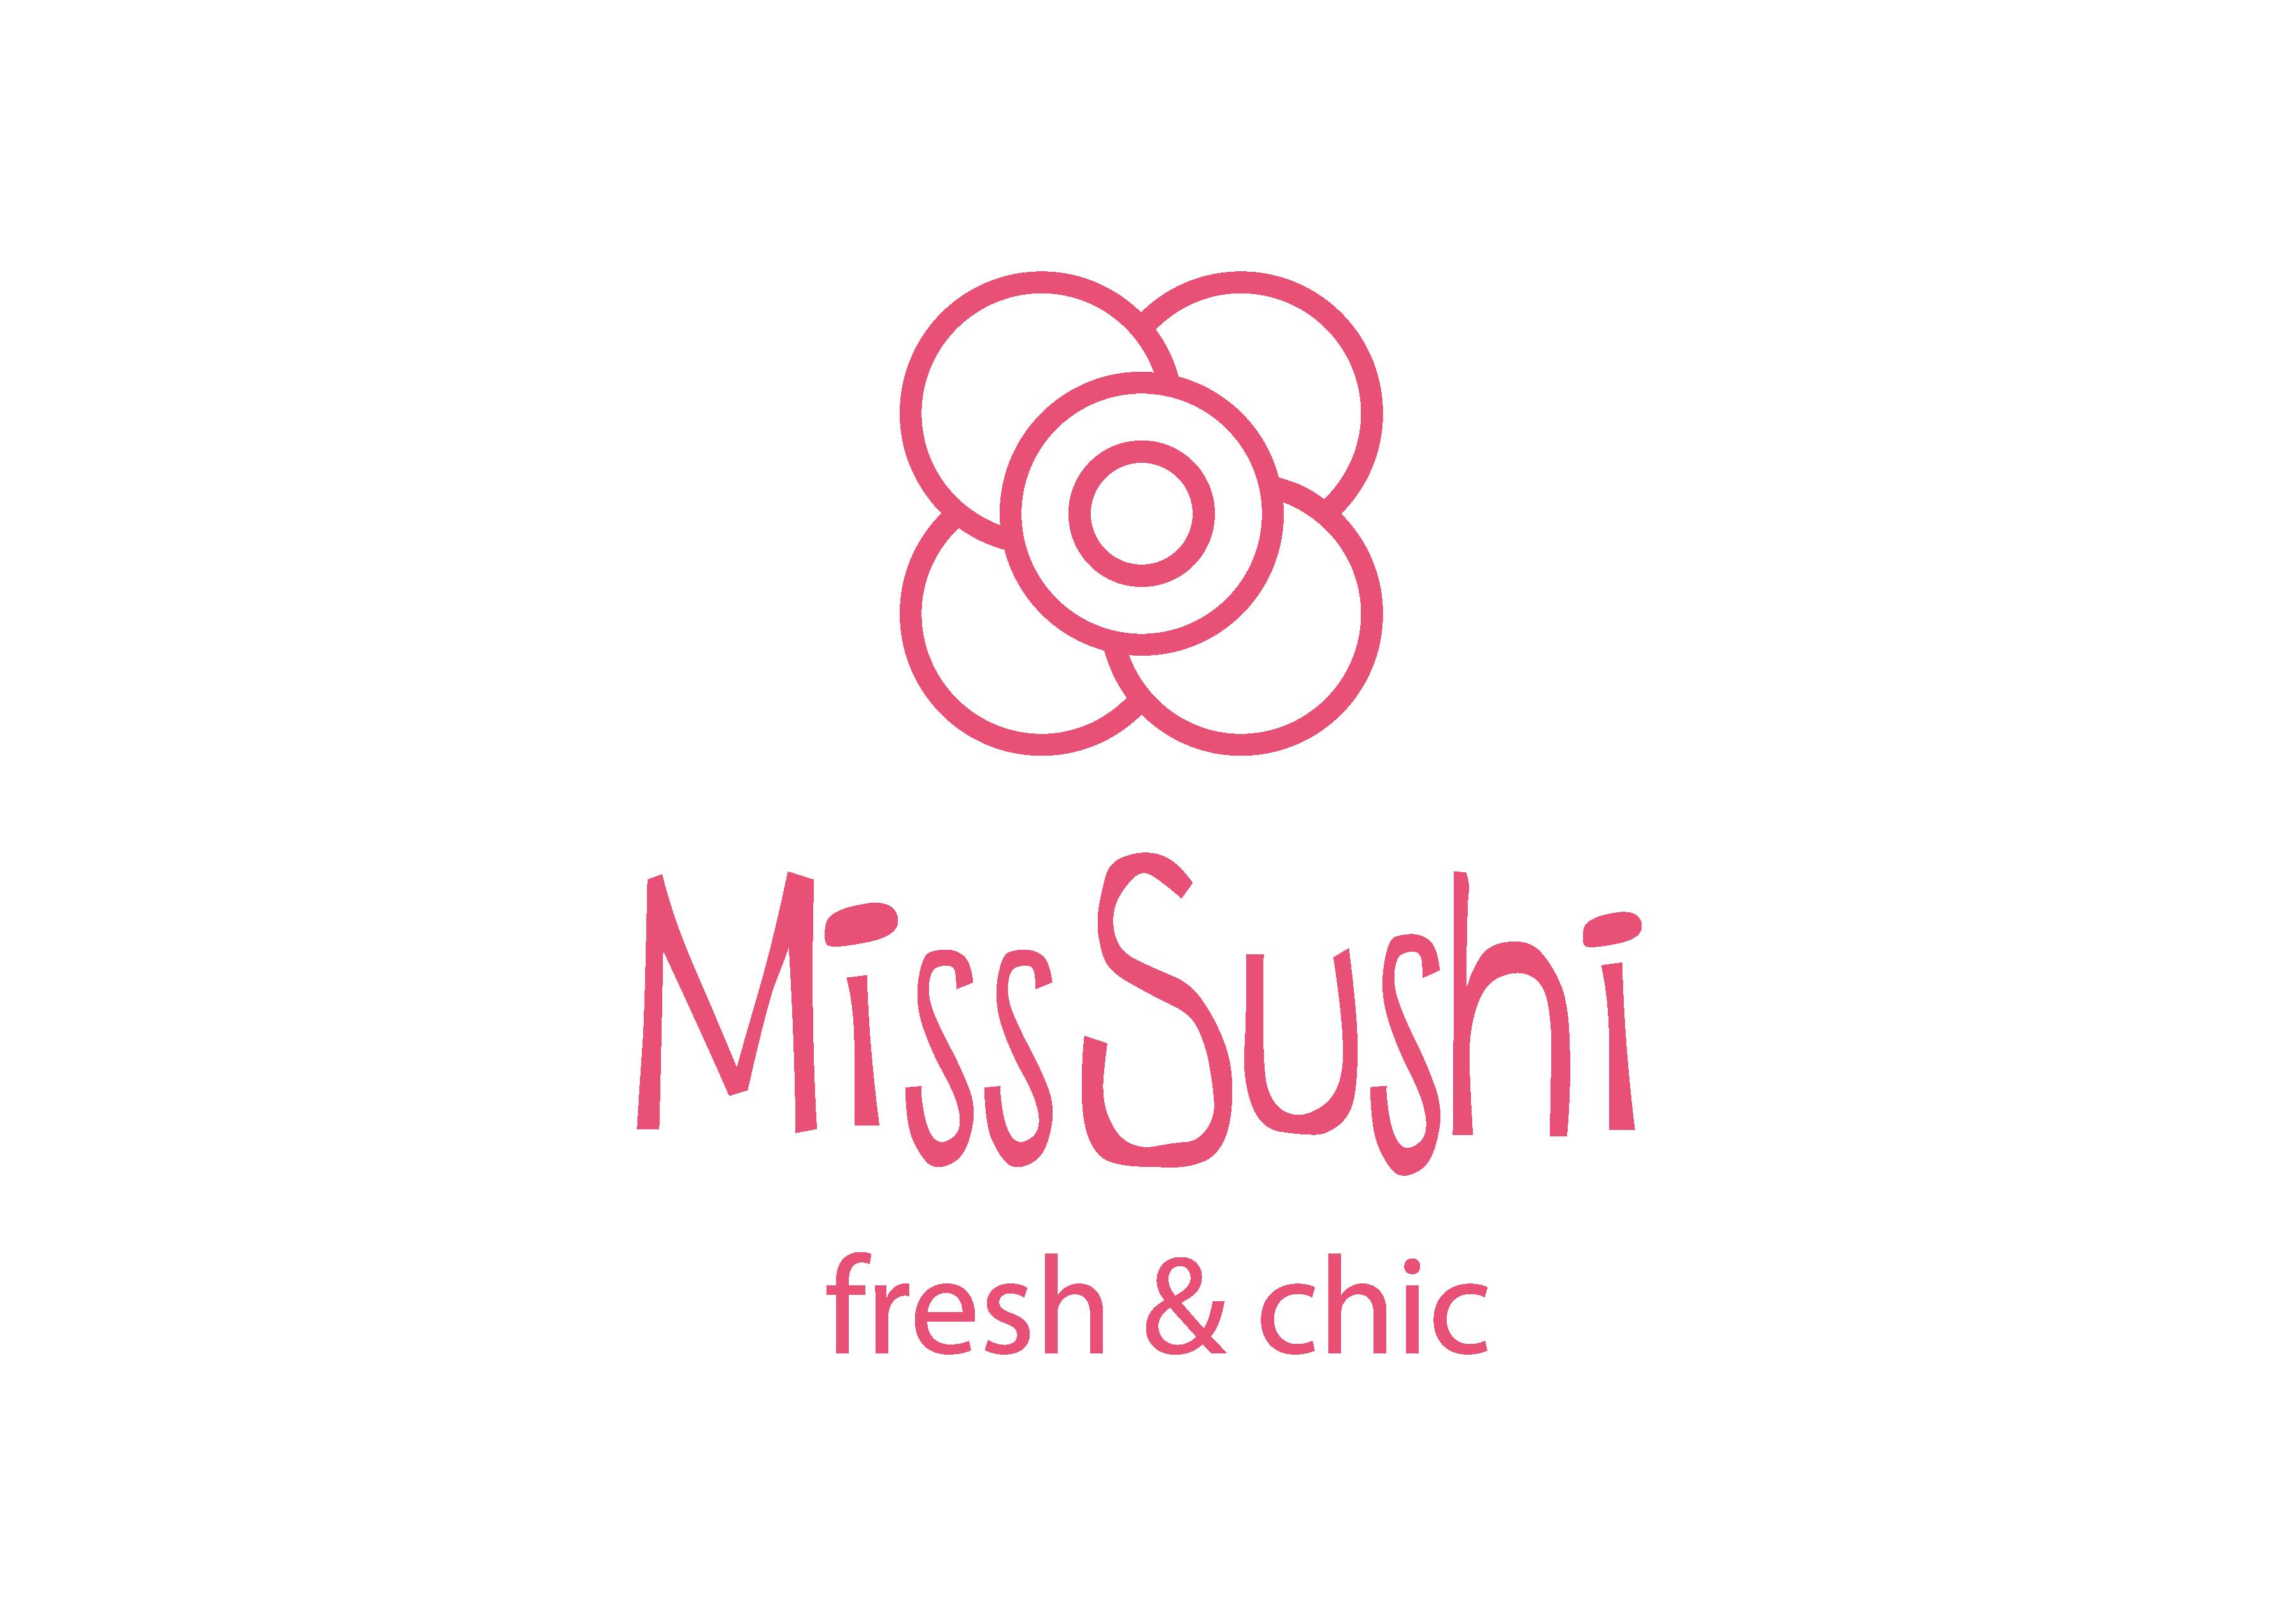 Logo Miss Sushi